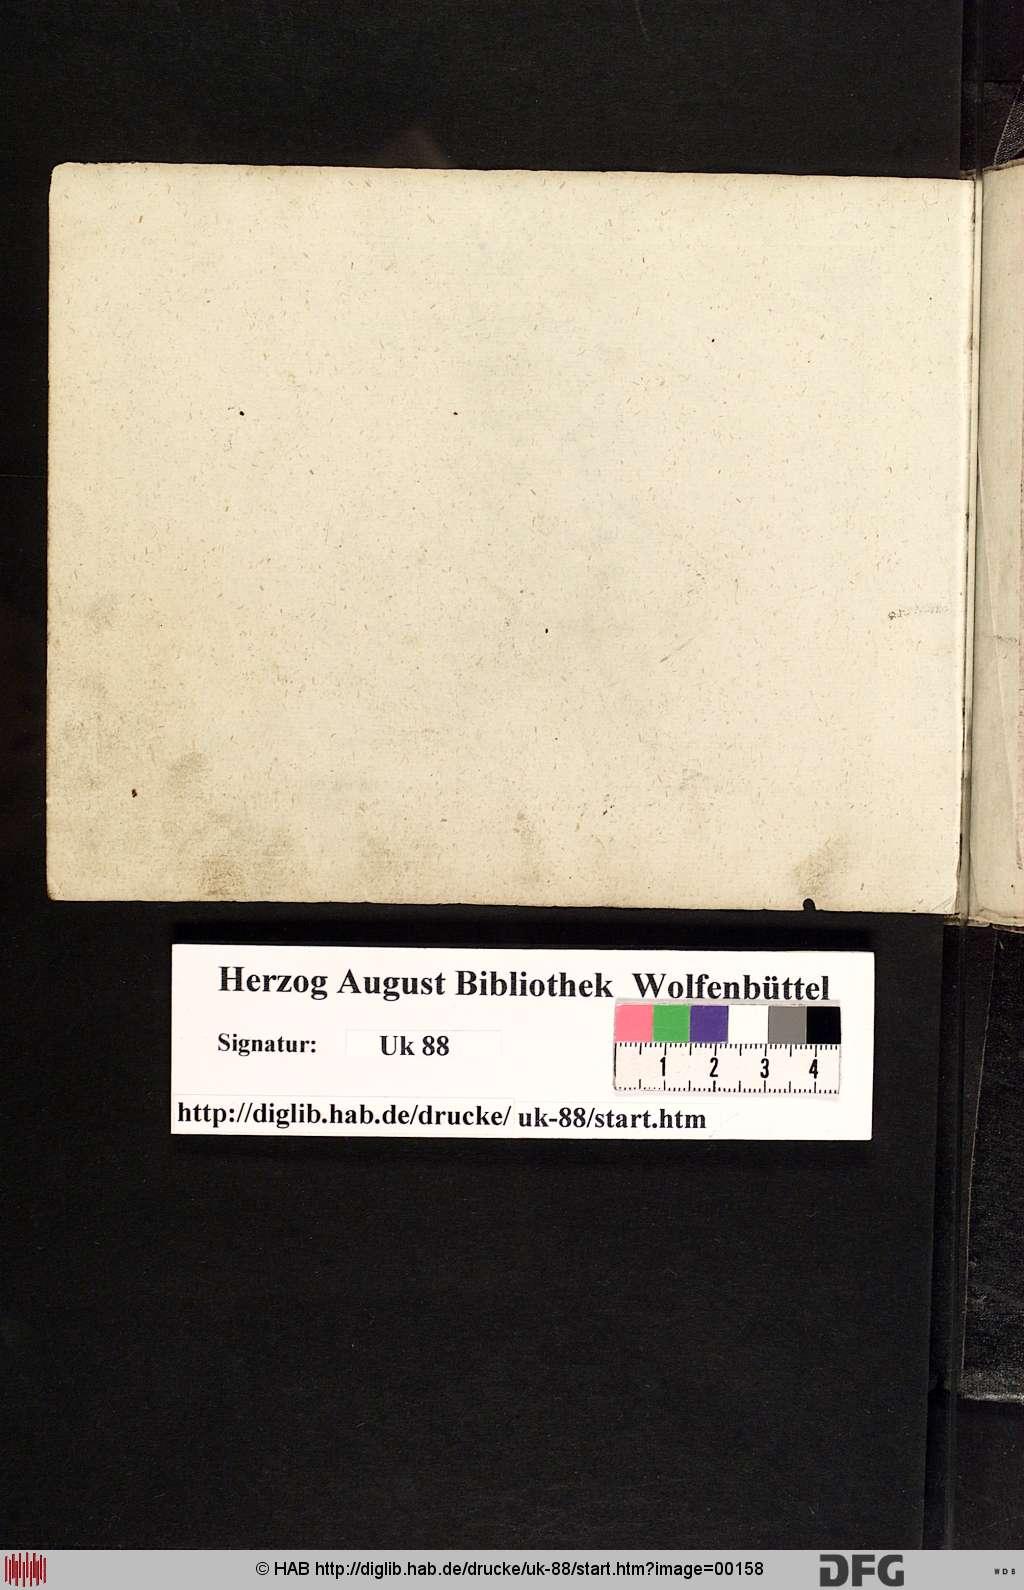 http://diglib.hab.de/drucke/uk-88/00158.jpg